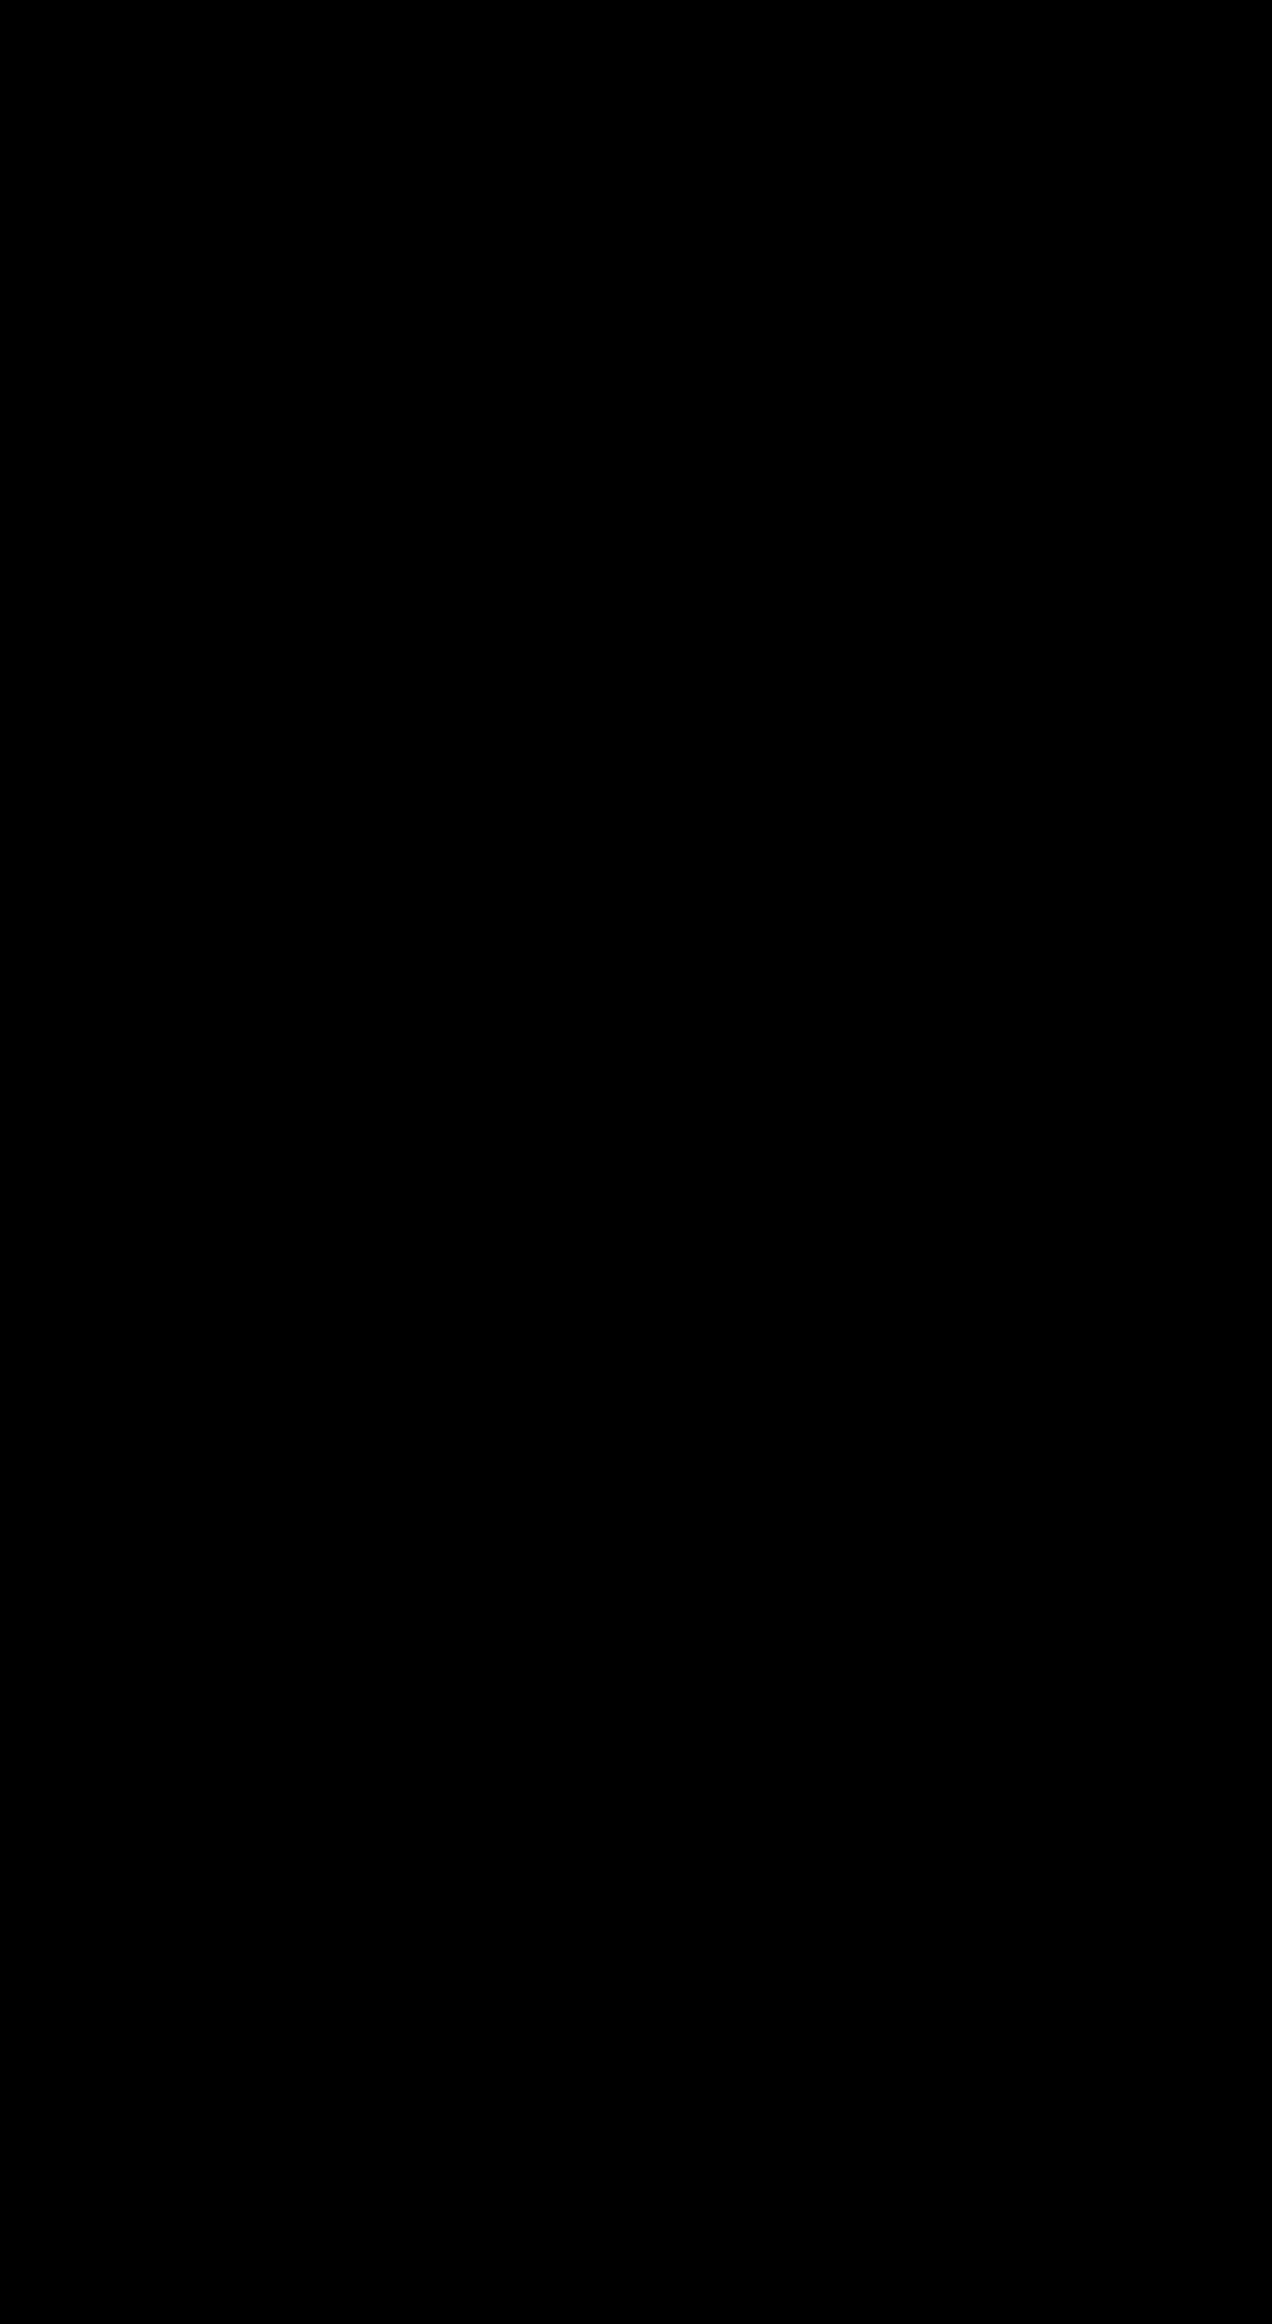 Clipart - Bodybuilder Flexing Back Muscles Silhouette